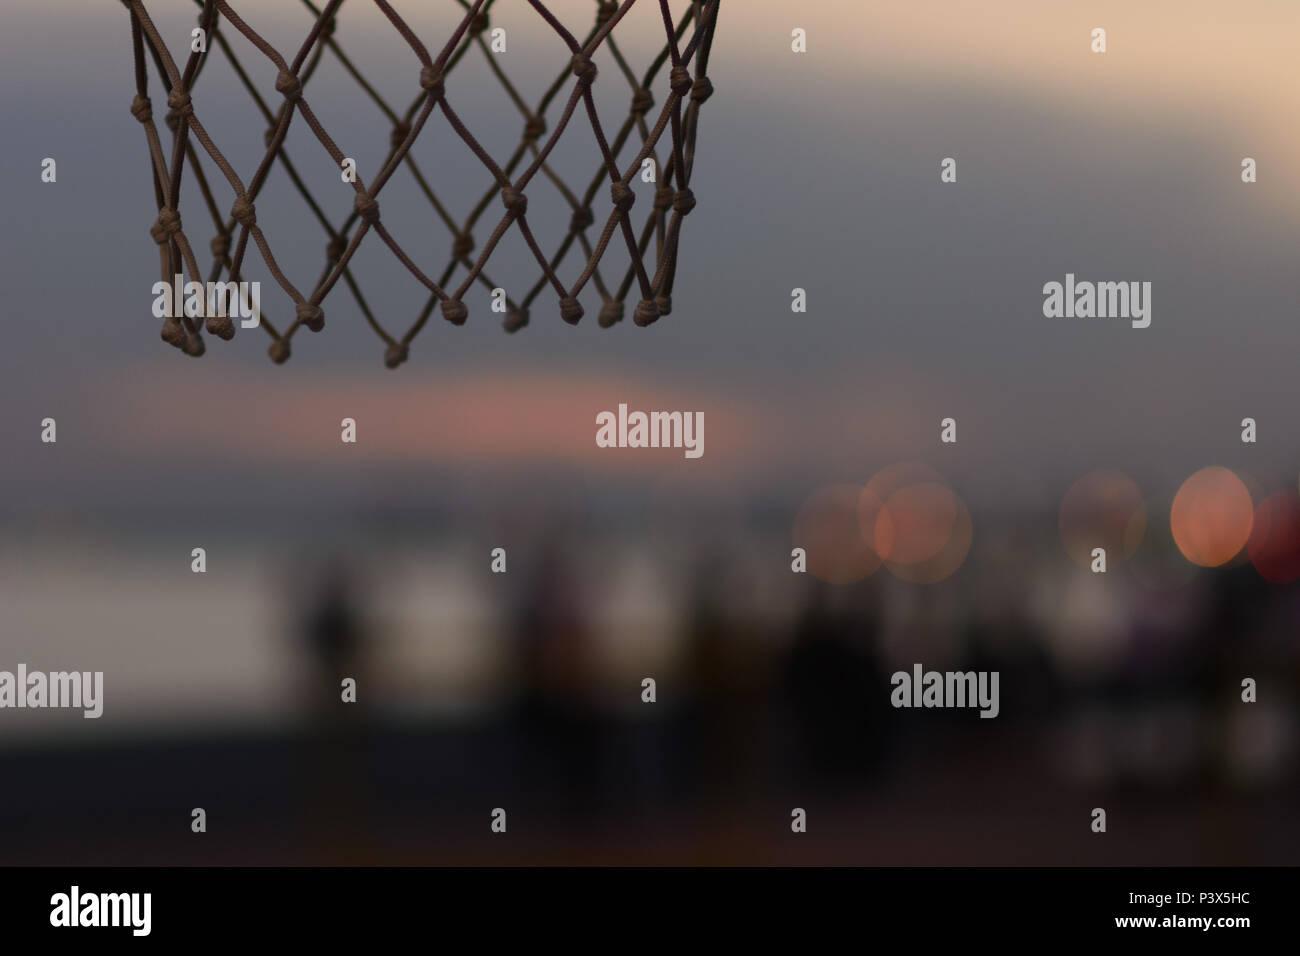 basketball hoop sunset - Stock Image